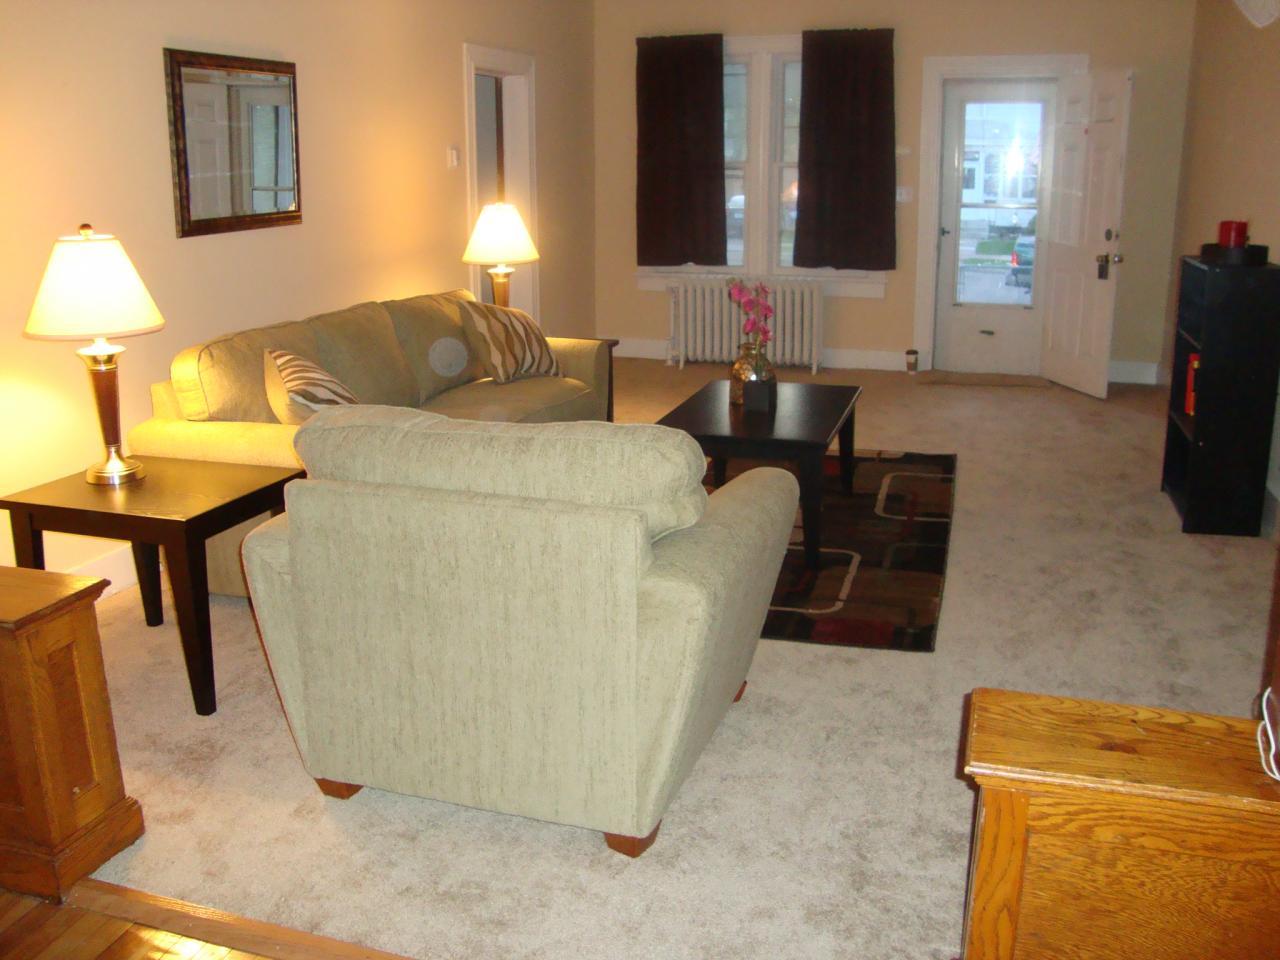 956 Clark Living Room - after